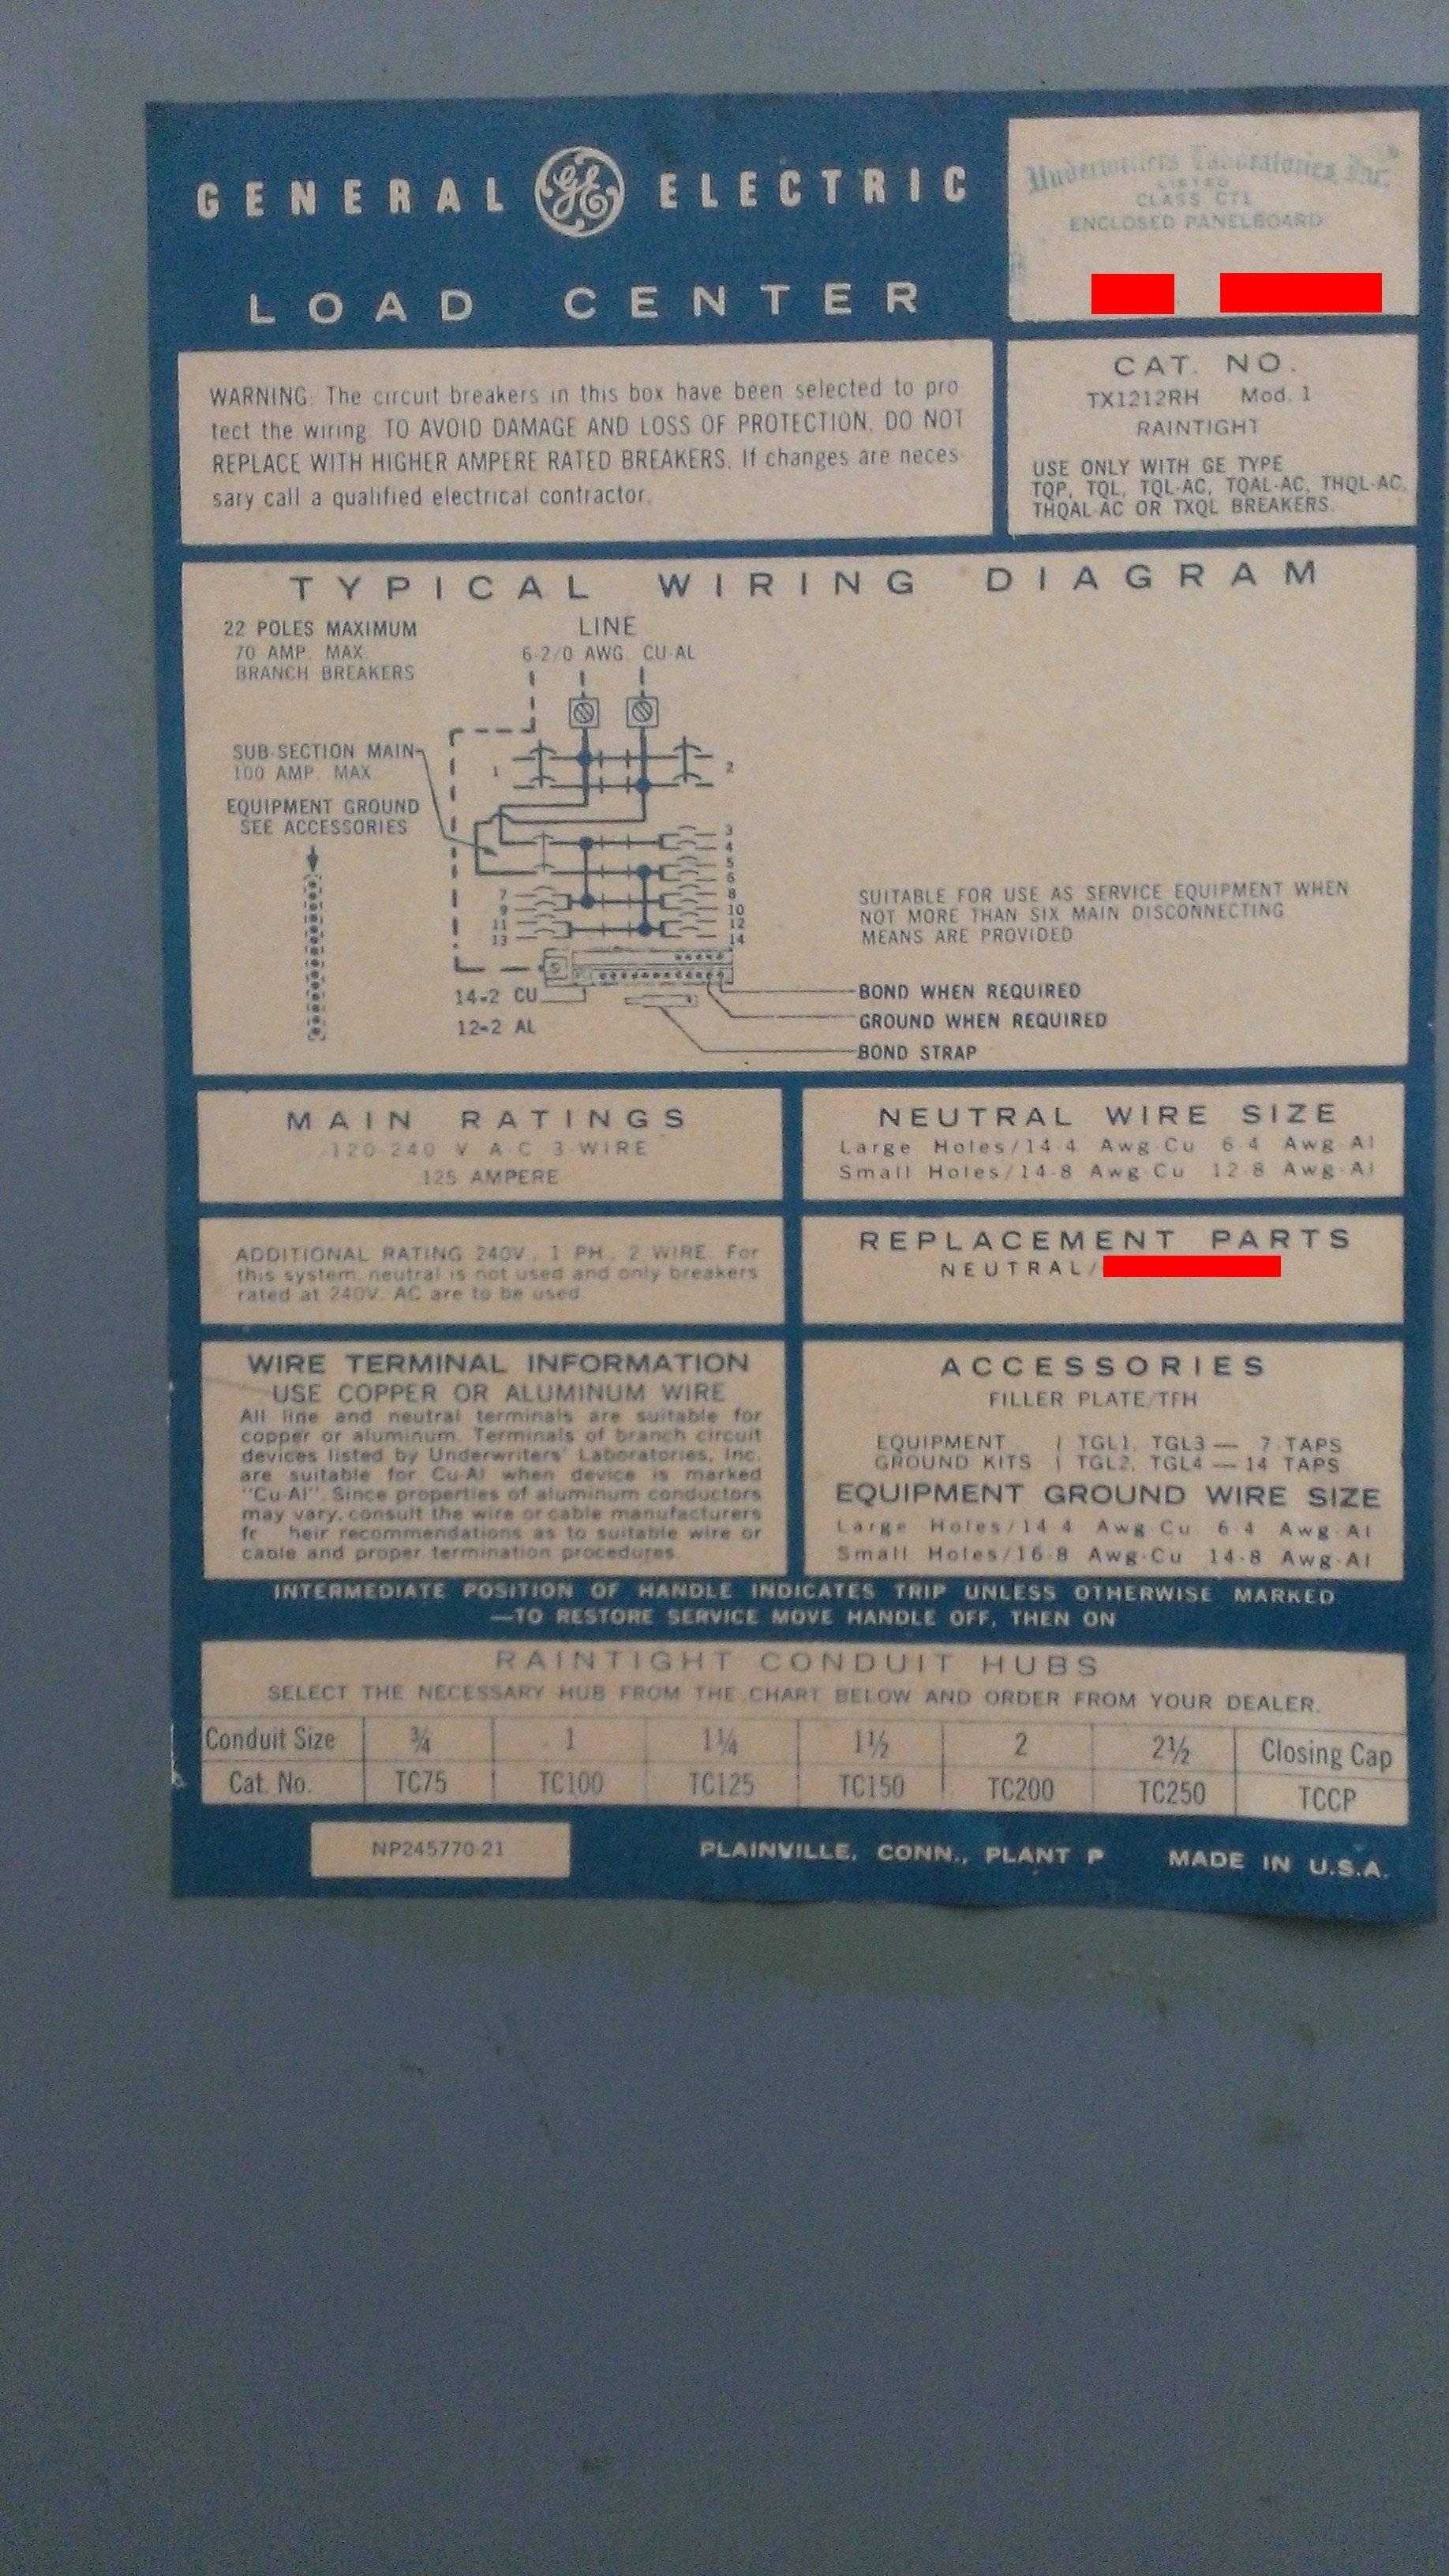 30A Load Center Wiring Diagram | Wiring Diagram - Ge Powermark Gold Load Center Wiring Diagram